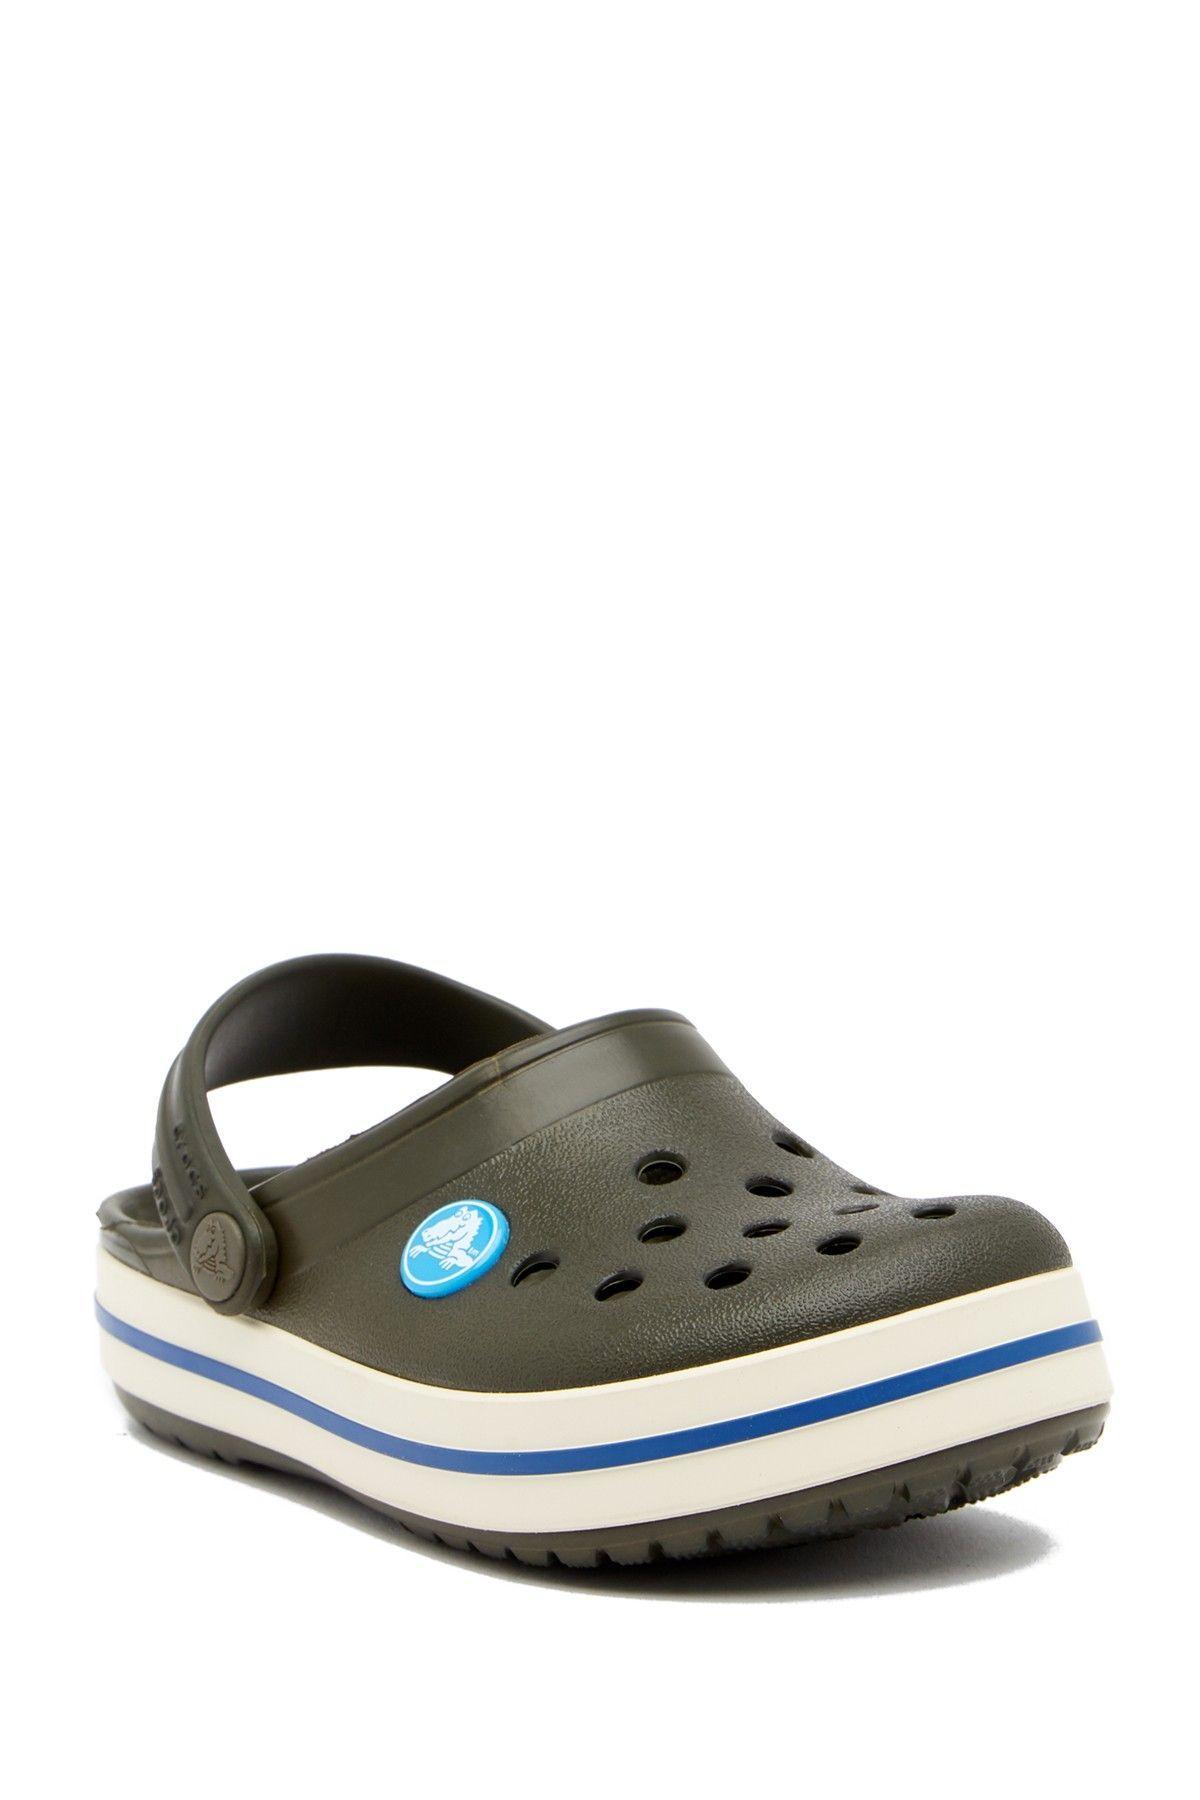 467c5913eb3d4 Crocband Clog (Toddler   Little Kid)  babyclogsoutfit